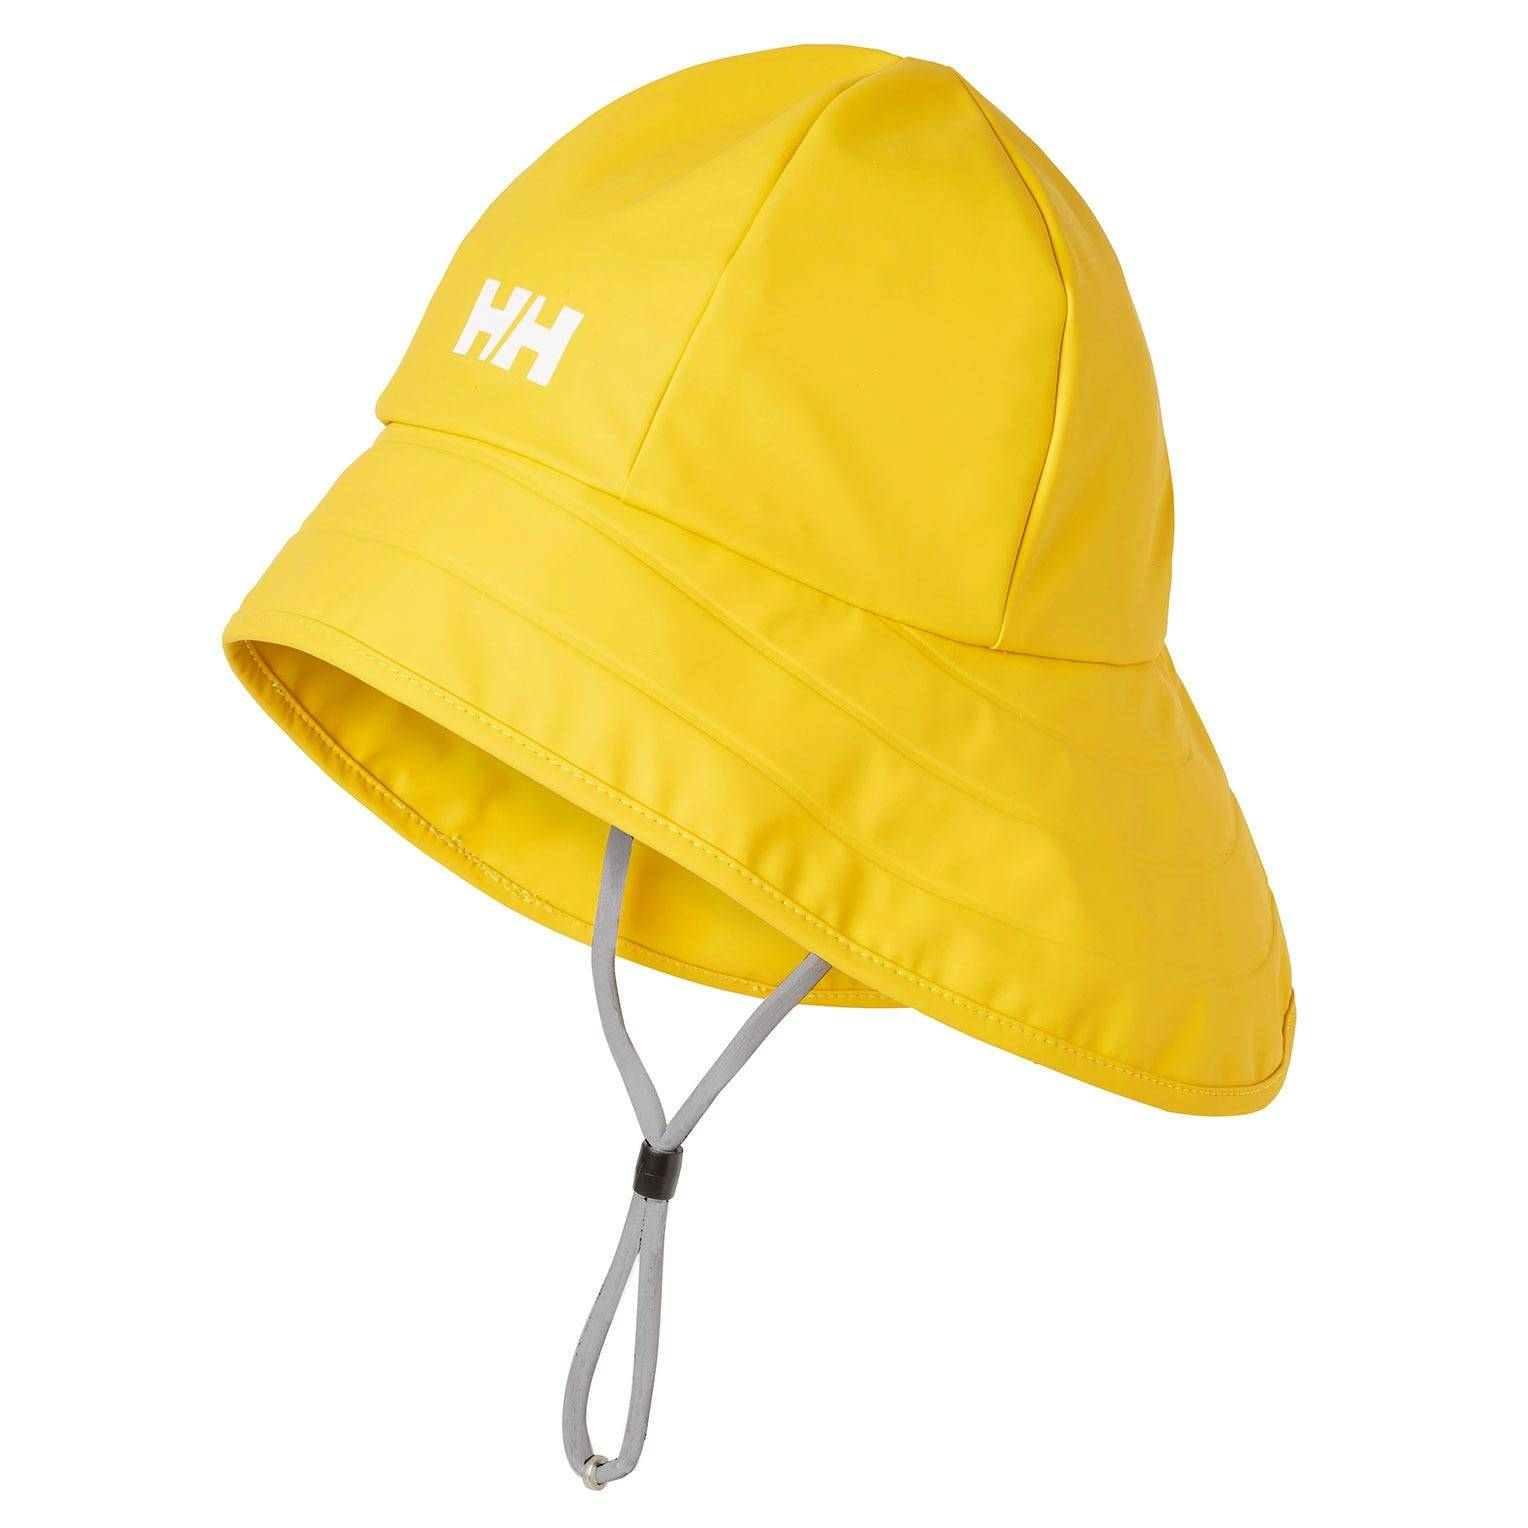 Helly Hansen Souwester Yellow STD